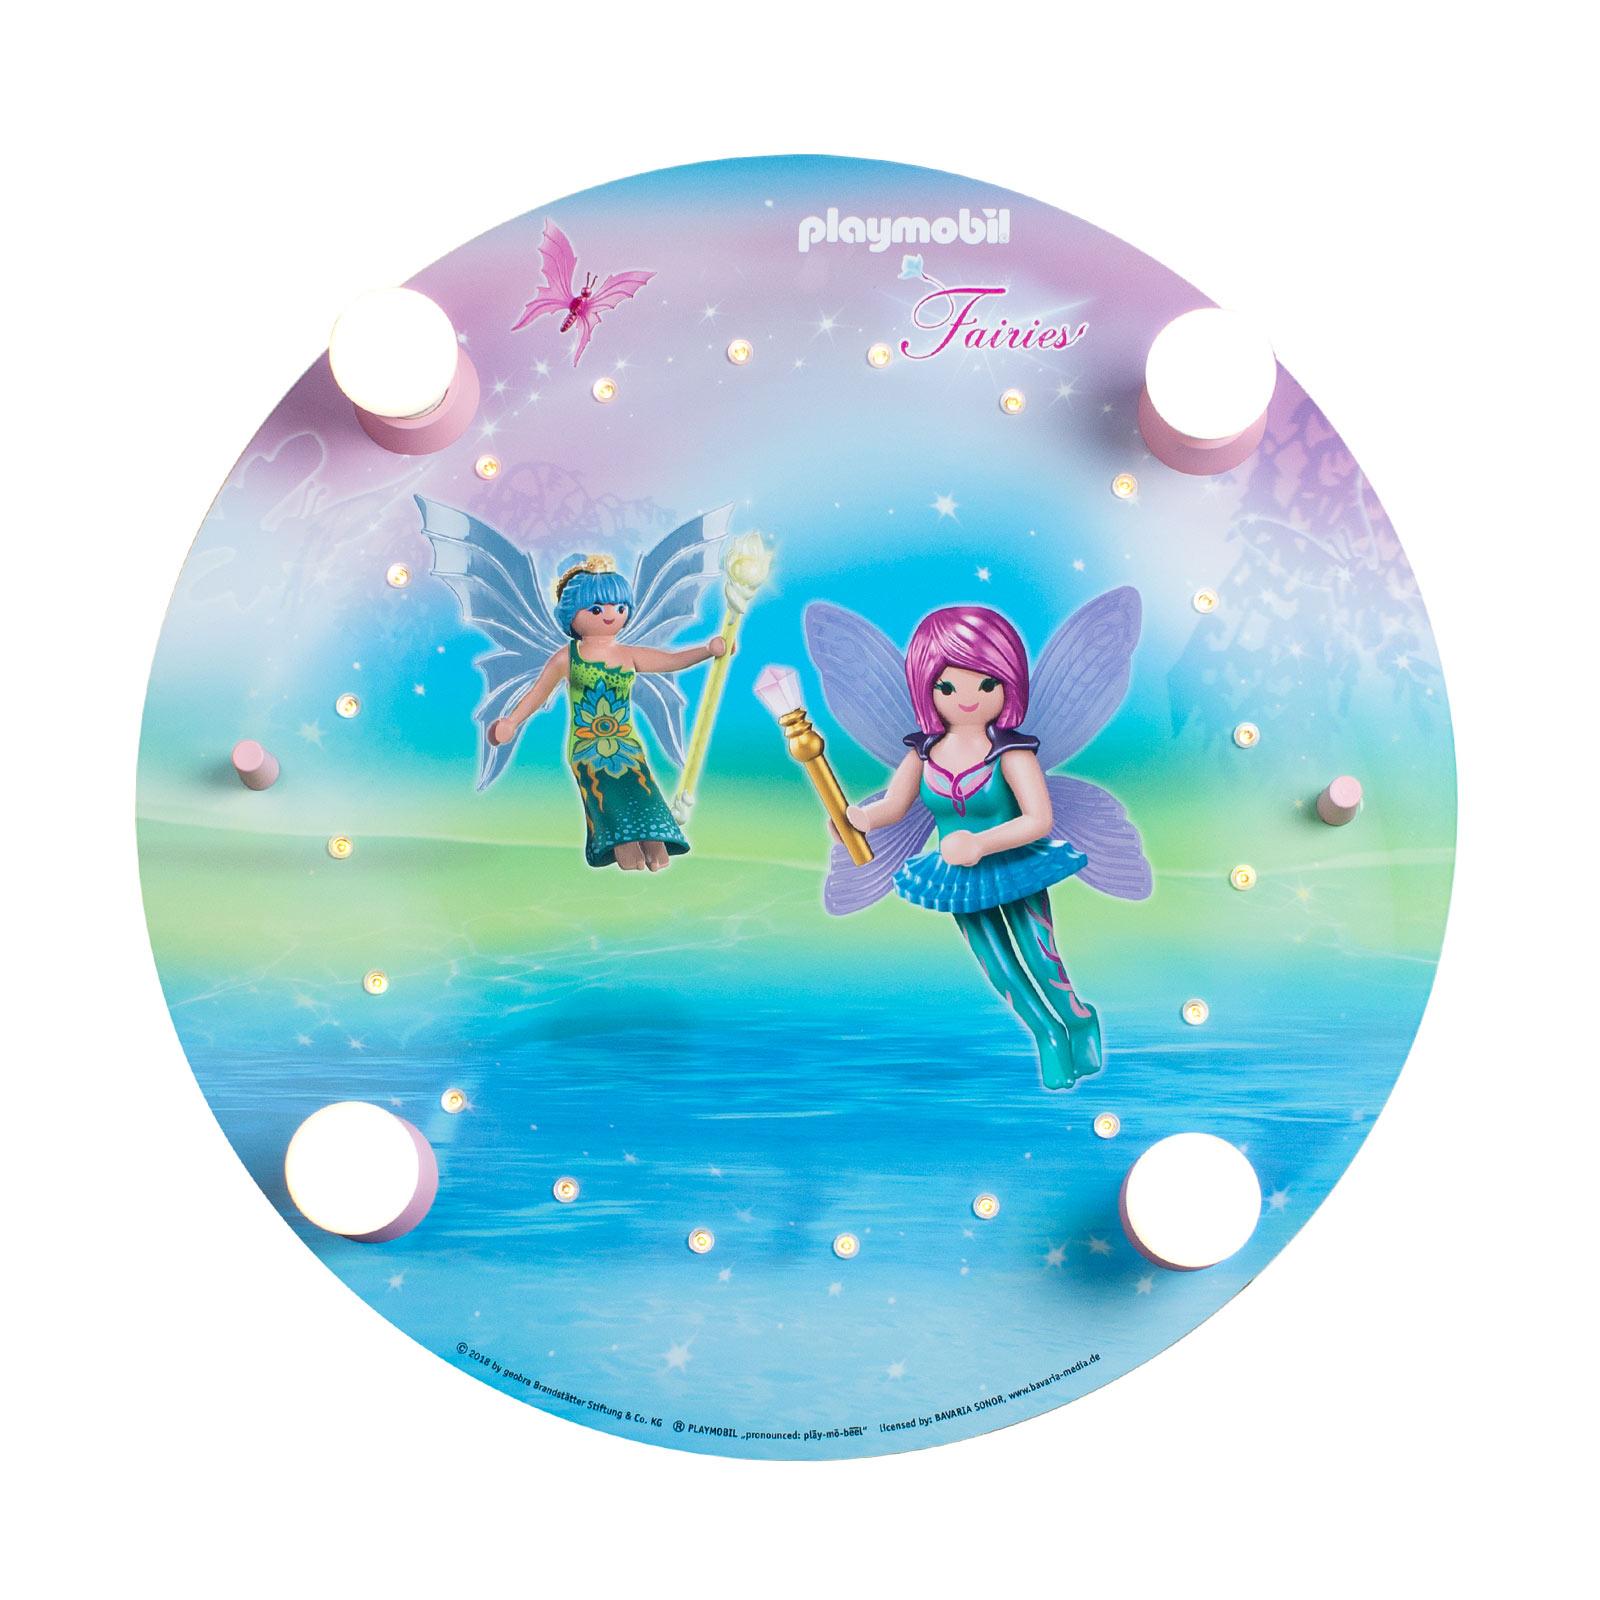 Plafondlamp Rondell PLAYMOBIL Fairies